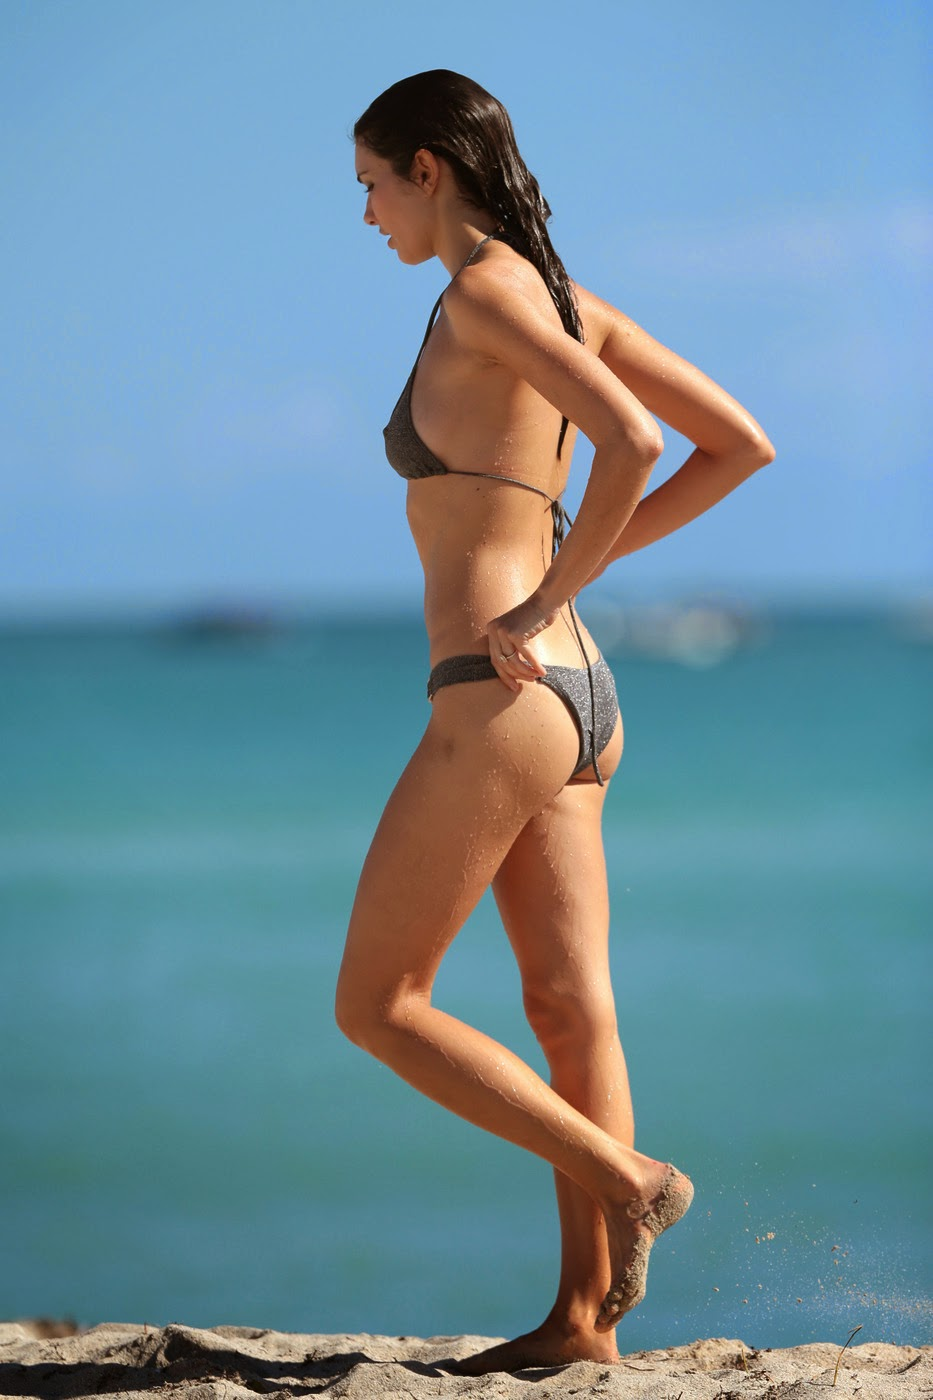 fashion model Teresa Moore bikini on the beach photo 9